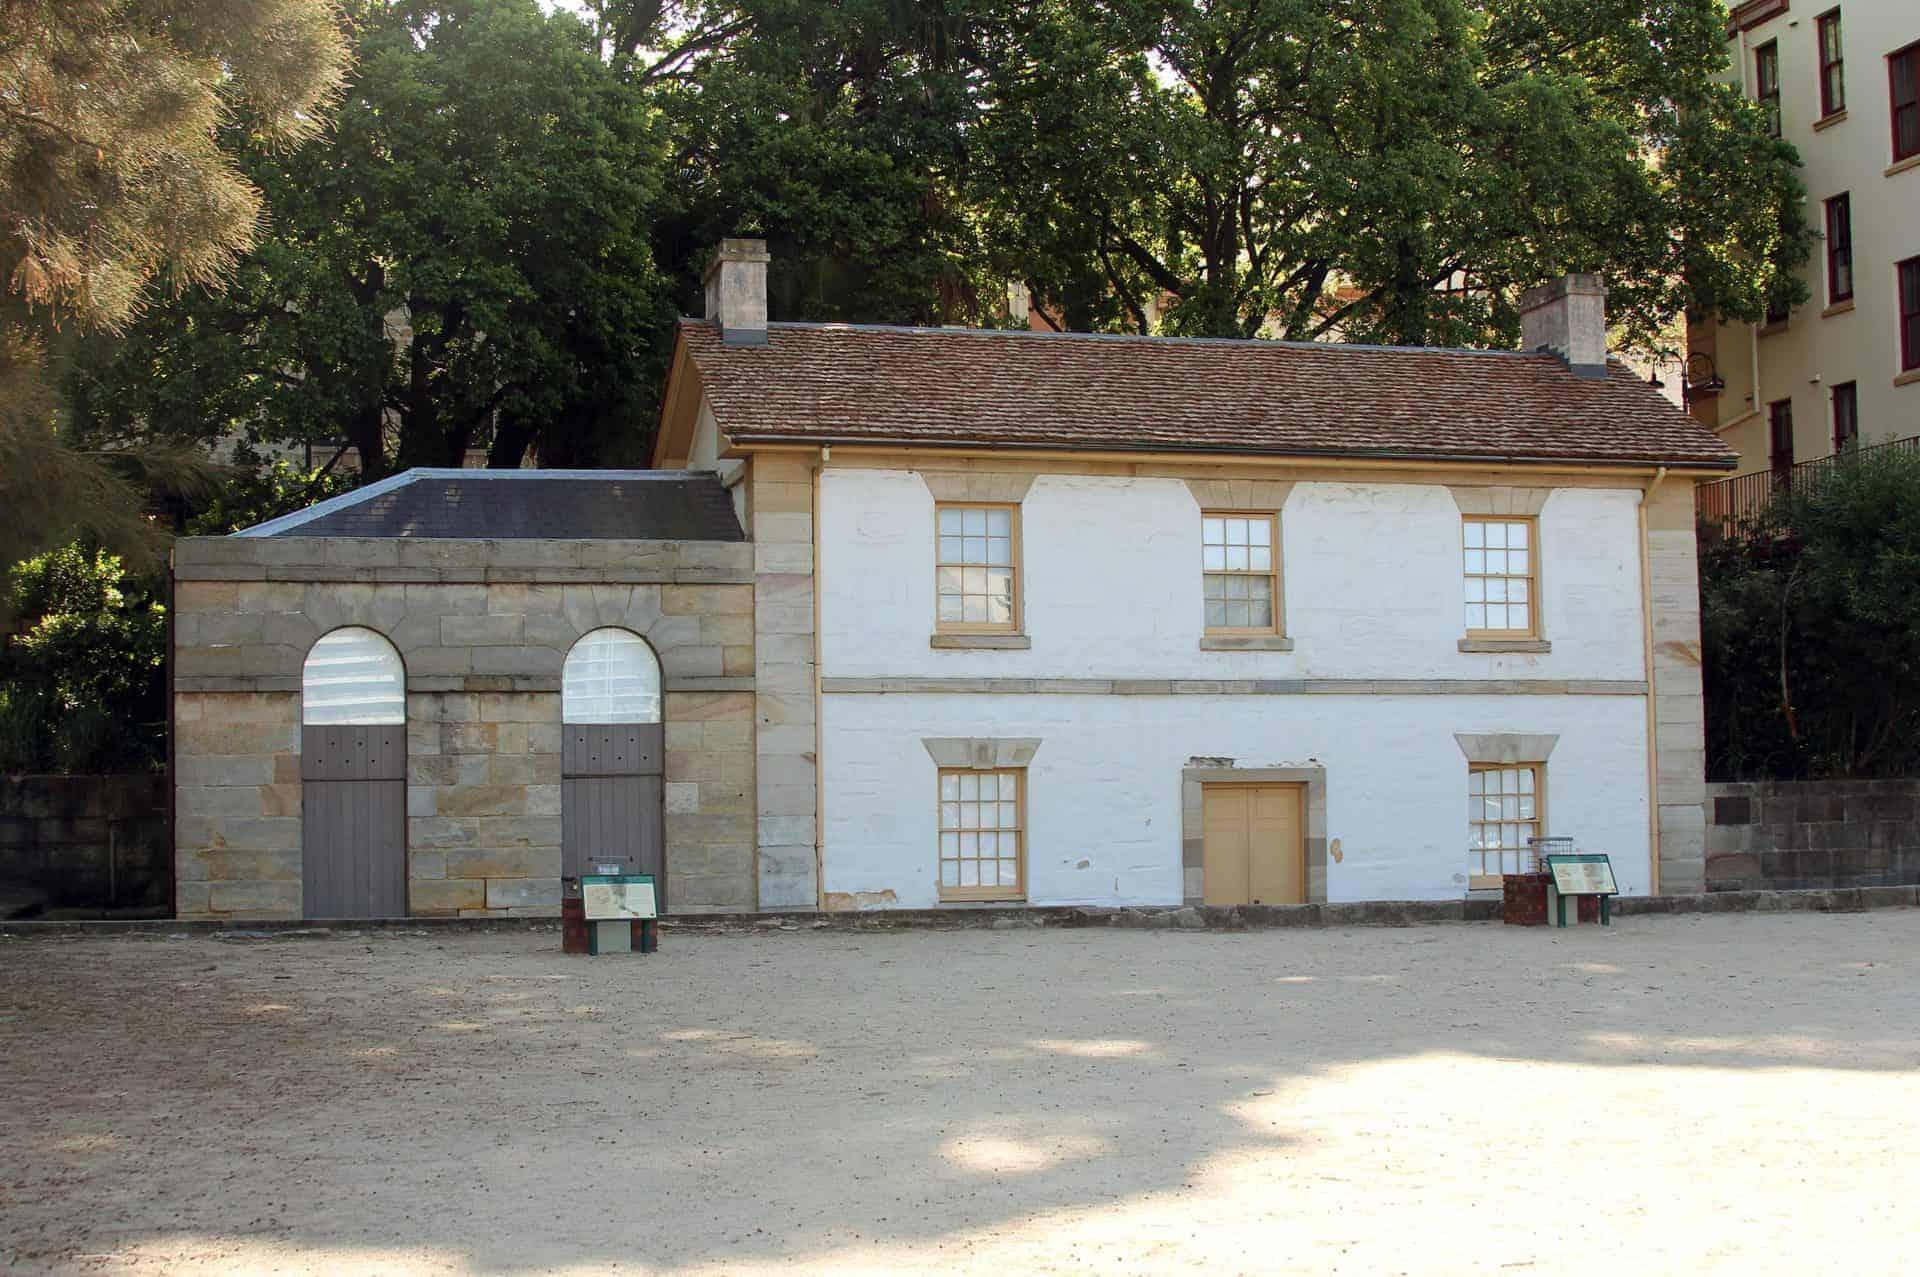 sydney_essential_point3_Front_of_Cadman's_Cottage